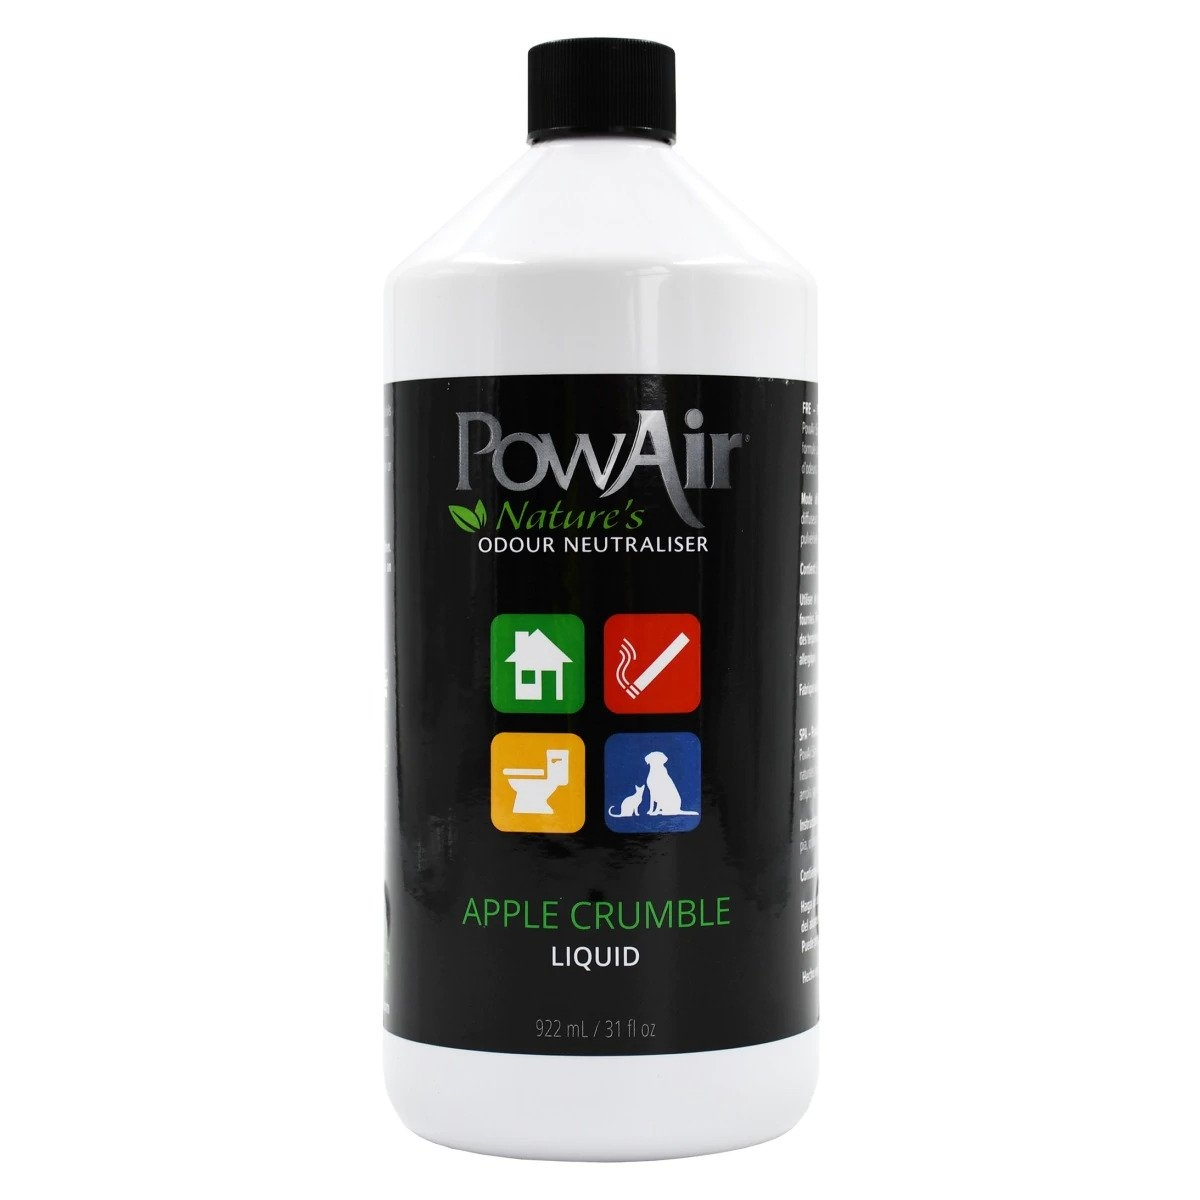 PowAir Liquid, Apple Crumble, 922ml imagine